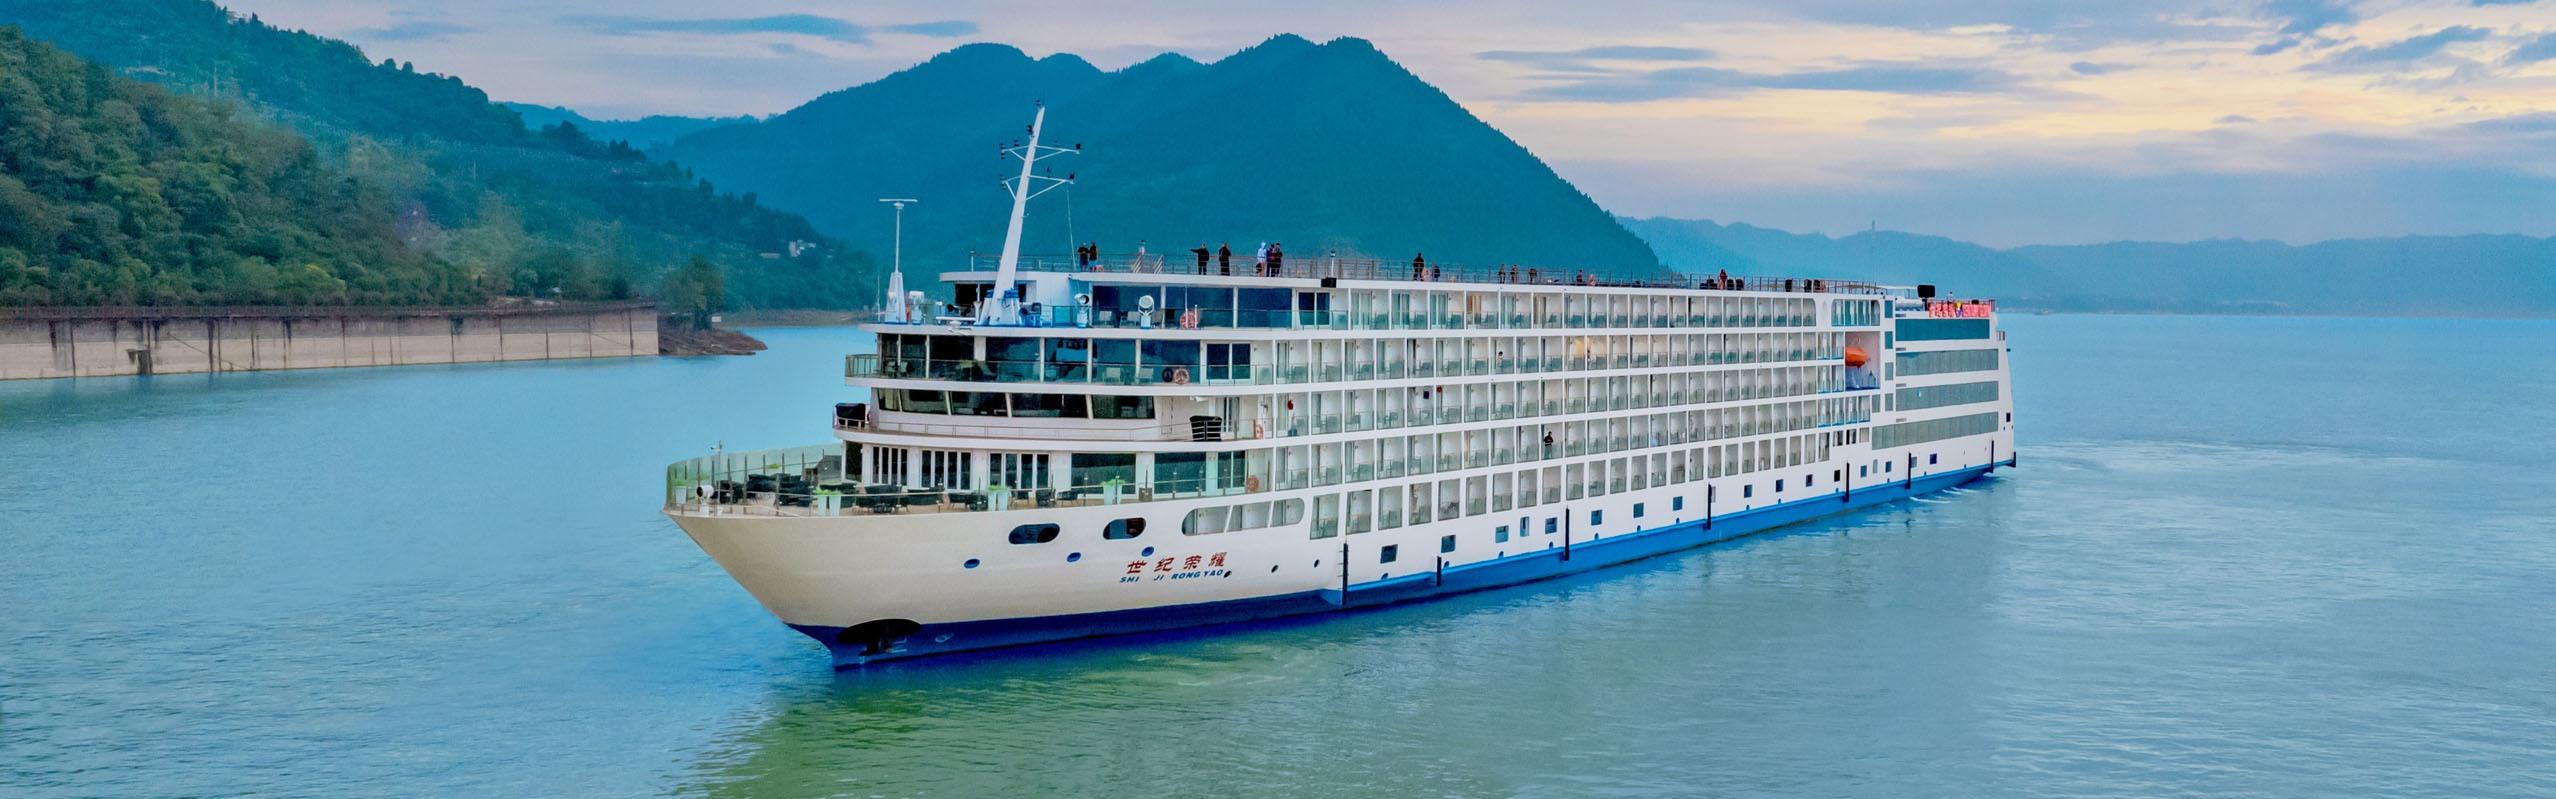 Century Glory - Century Cruises New Flagship River Cruise Ship